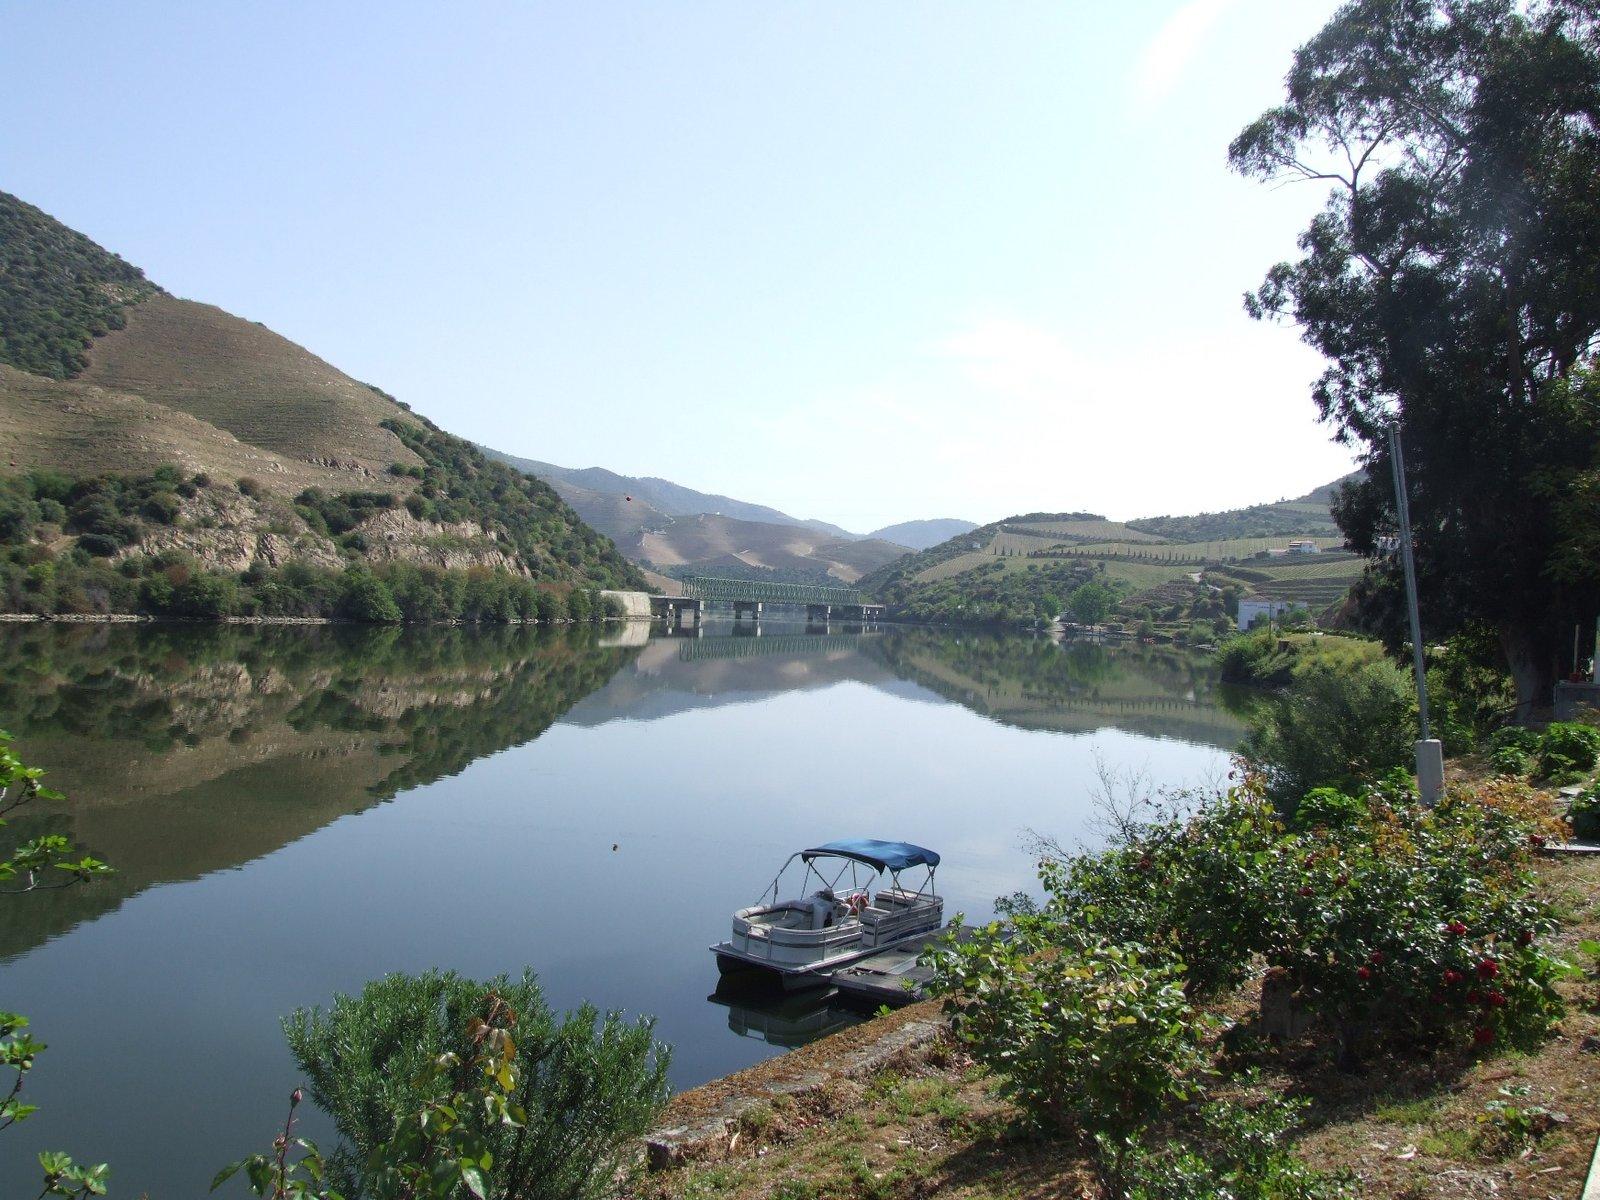 Nelson_Carvalheiro_Douro_Valley (22)